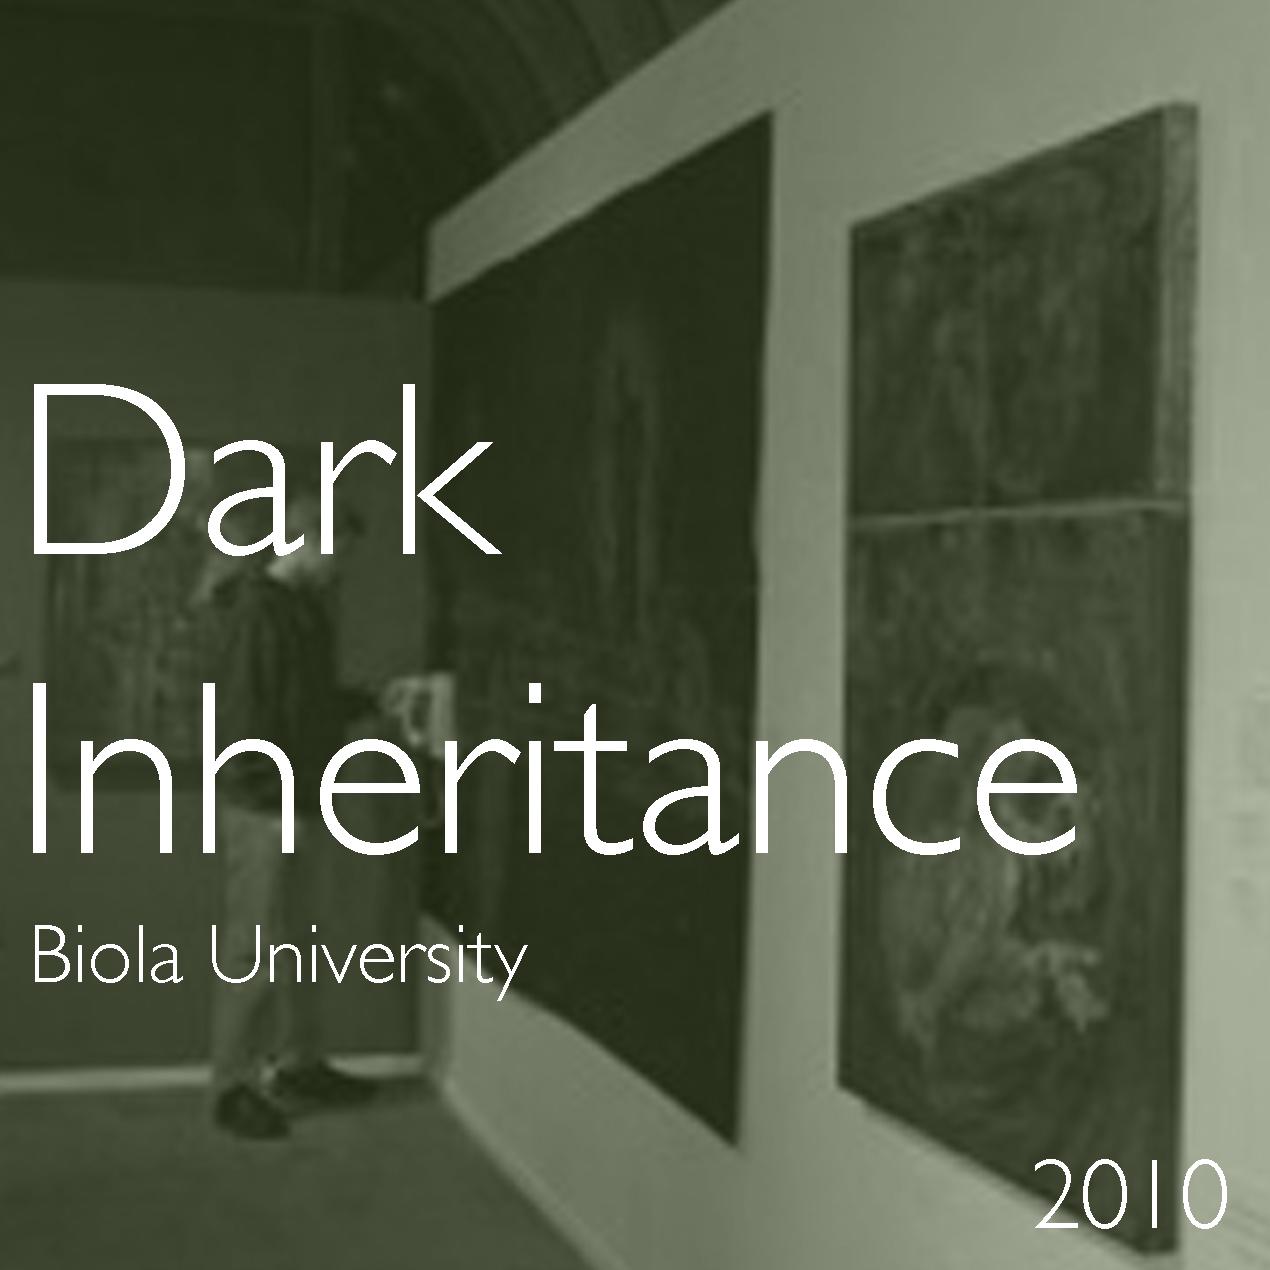 DarkInheritanceBiolaIcon.jpg